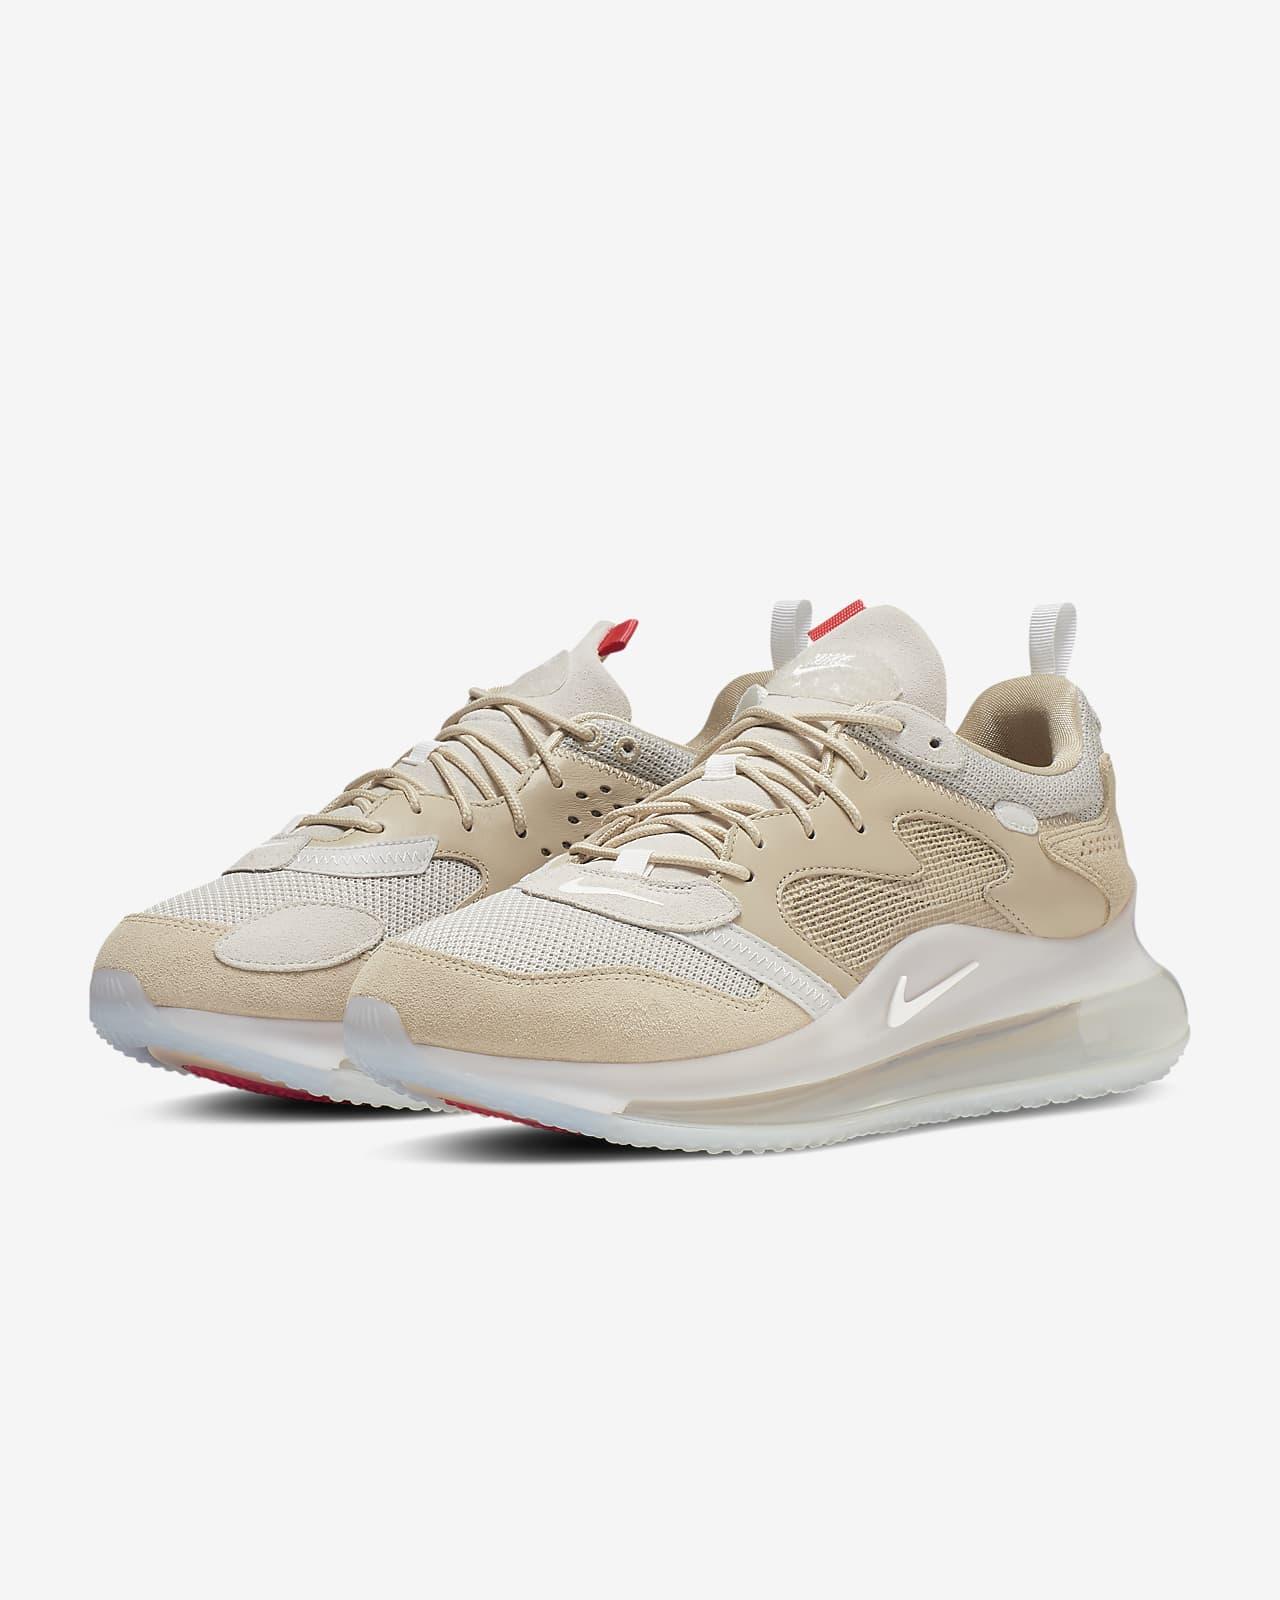 nike chaussure 720